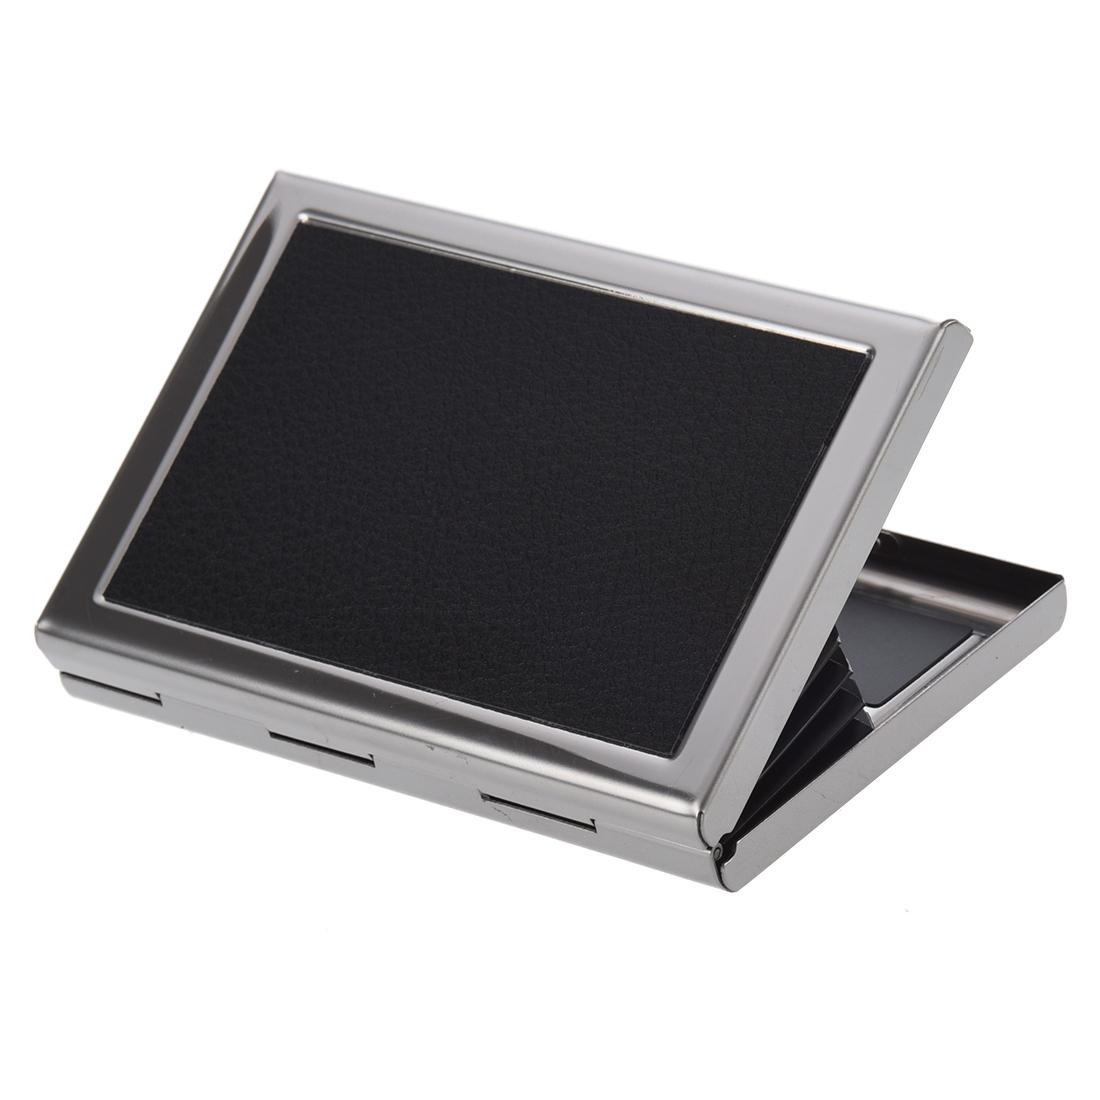 pocket boite de carte de credit en aluminium porte carte etanche portable wt. Black Bedroom Furniture Sets. Home Design Ideas